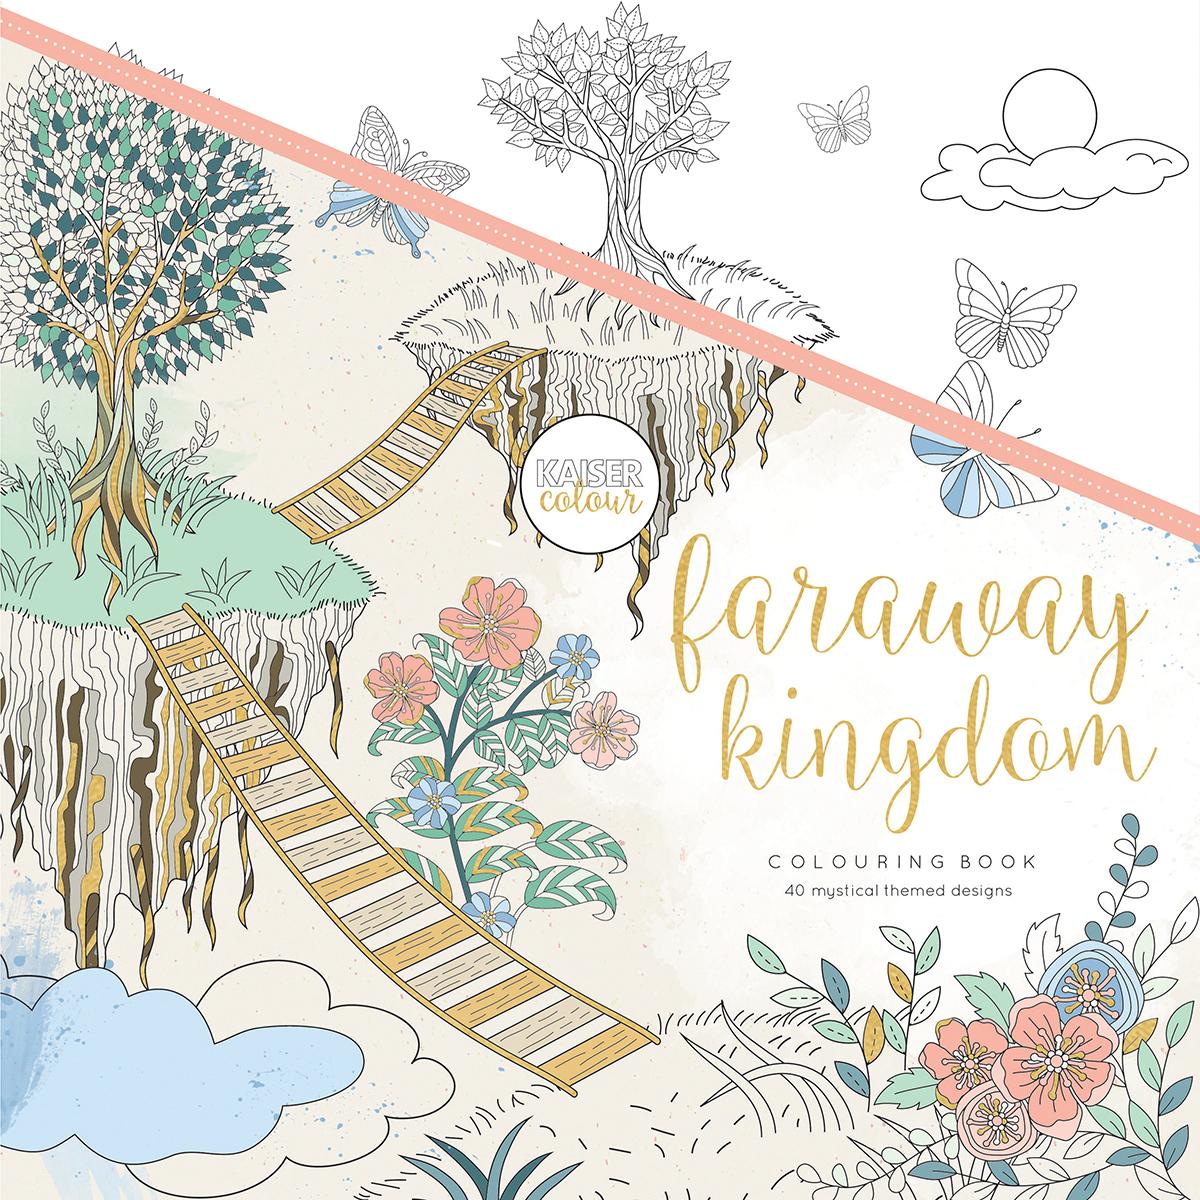 """KaiserColour Perfect Bound Coloring Book 9.75""""X9.75""""-Faraway Kingdom"""